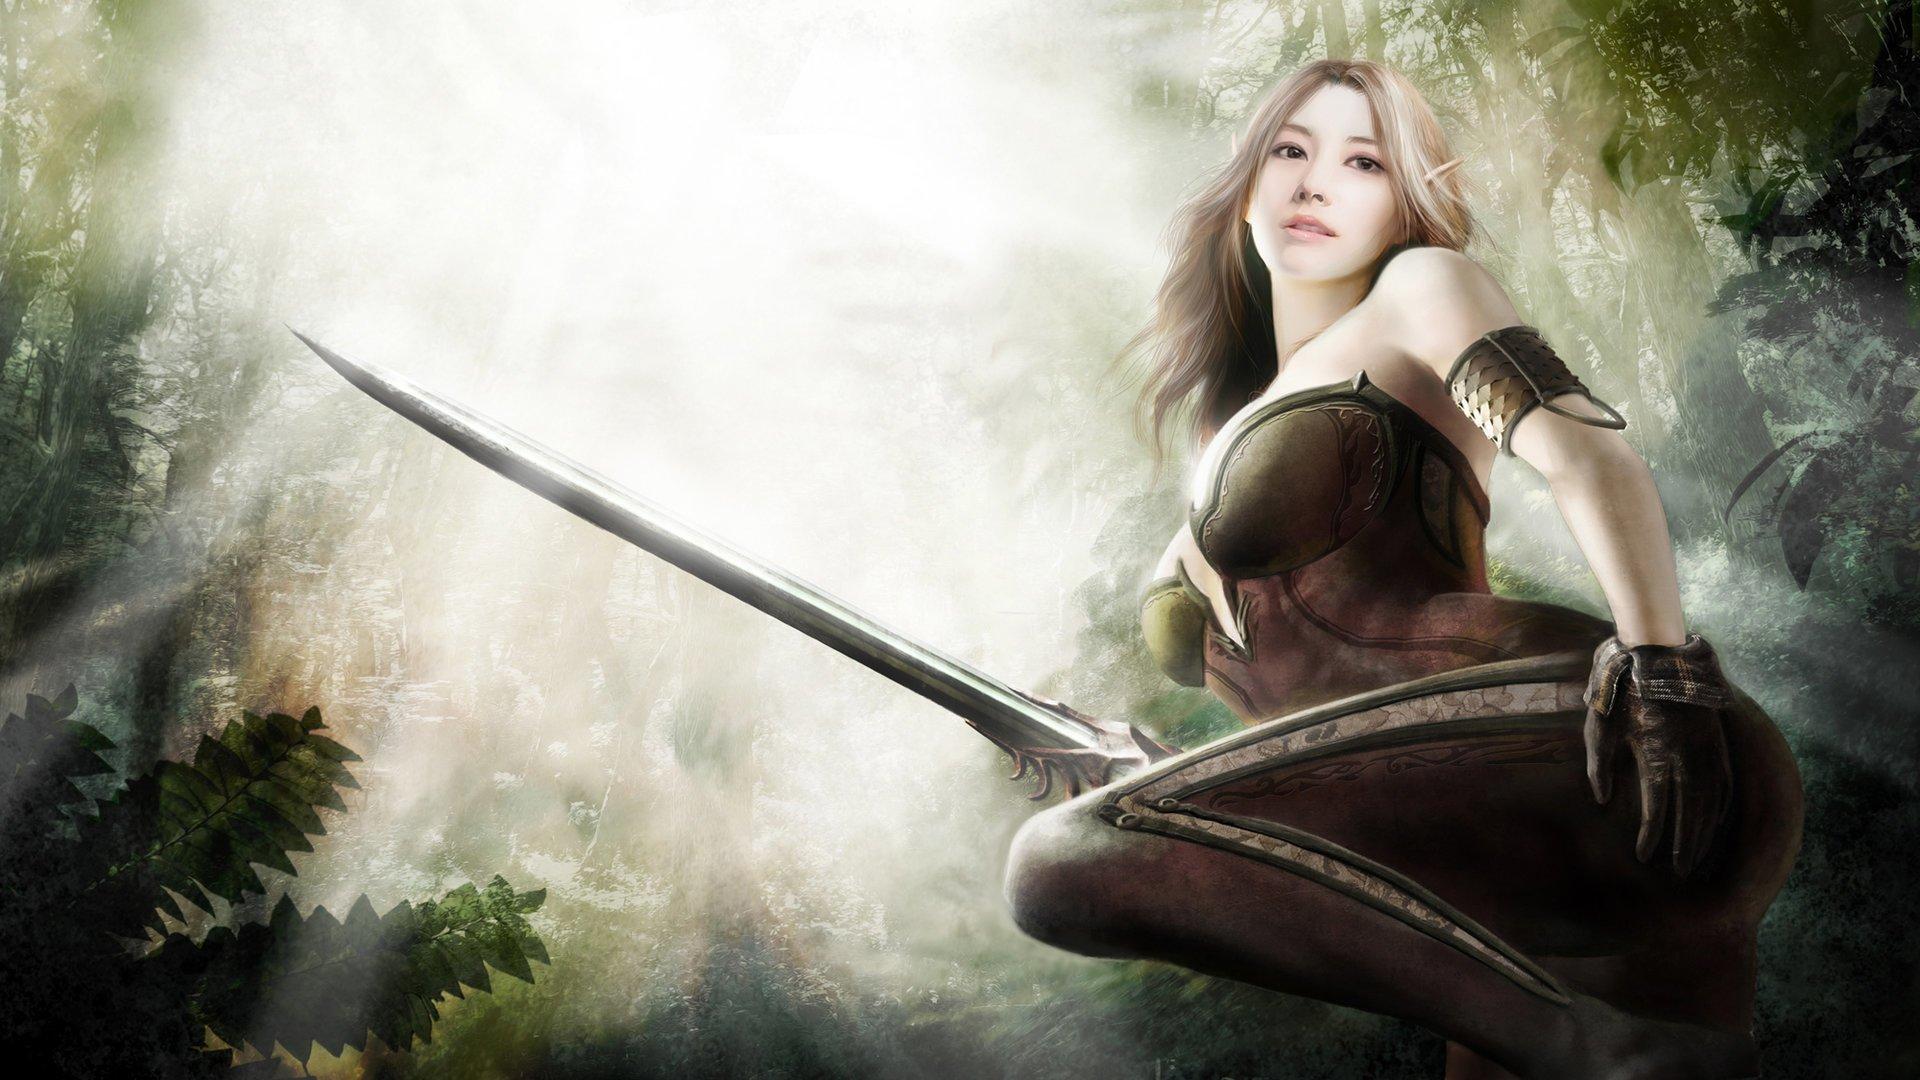 download wallpaper female warrior - photo #17